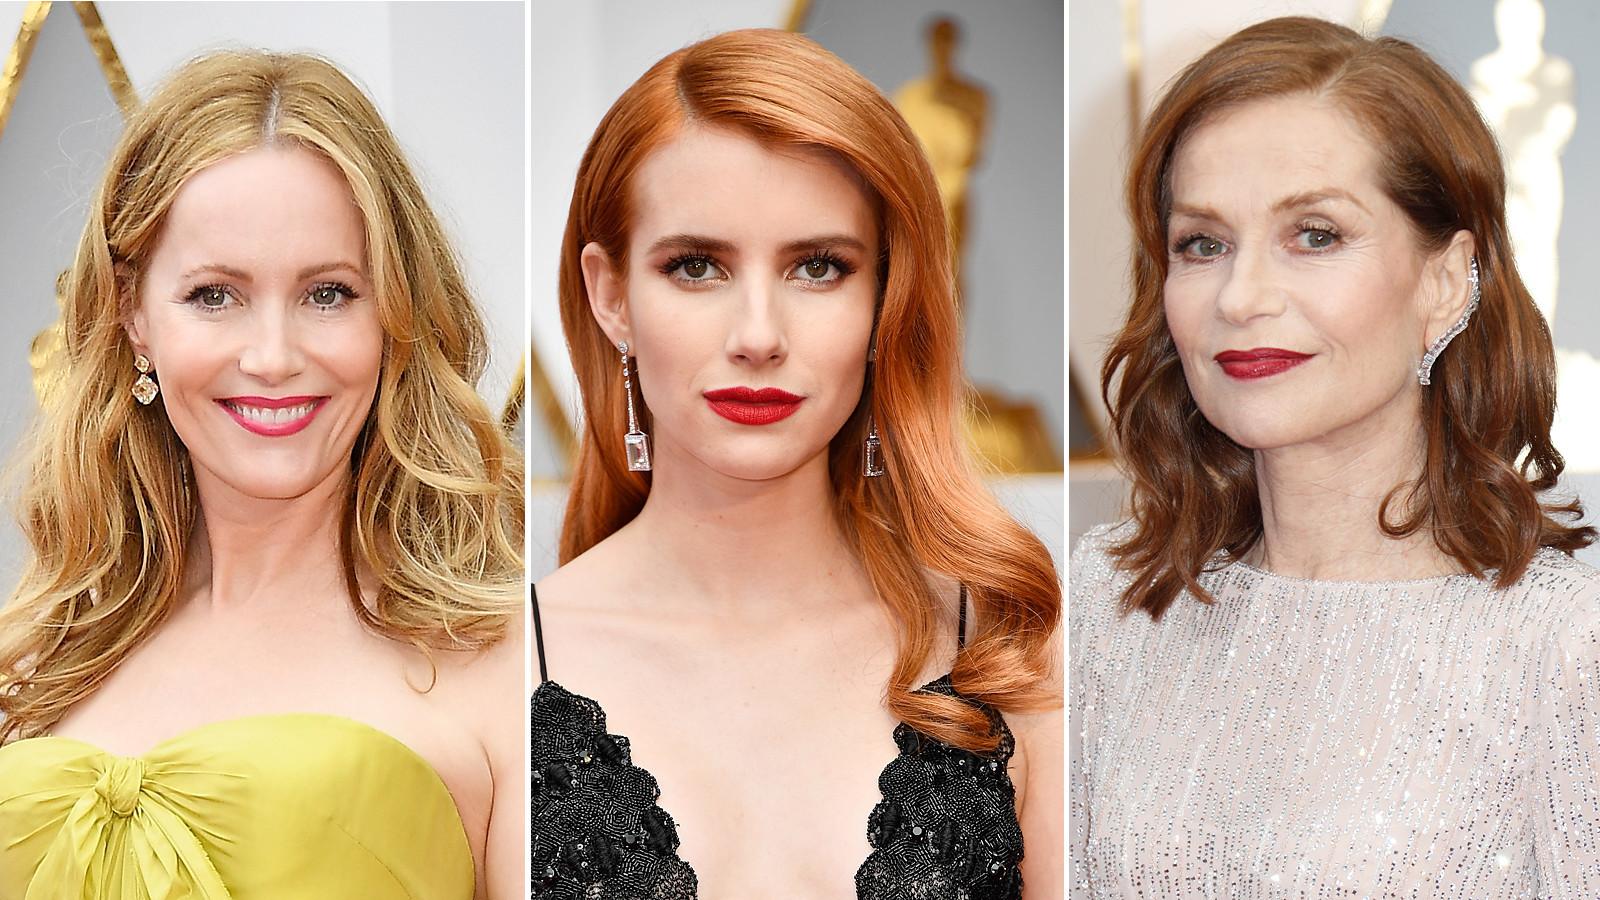 la-et-wavy-hair-trio-photo.jpg